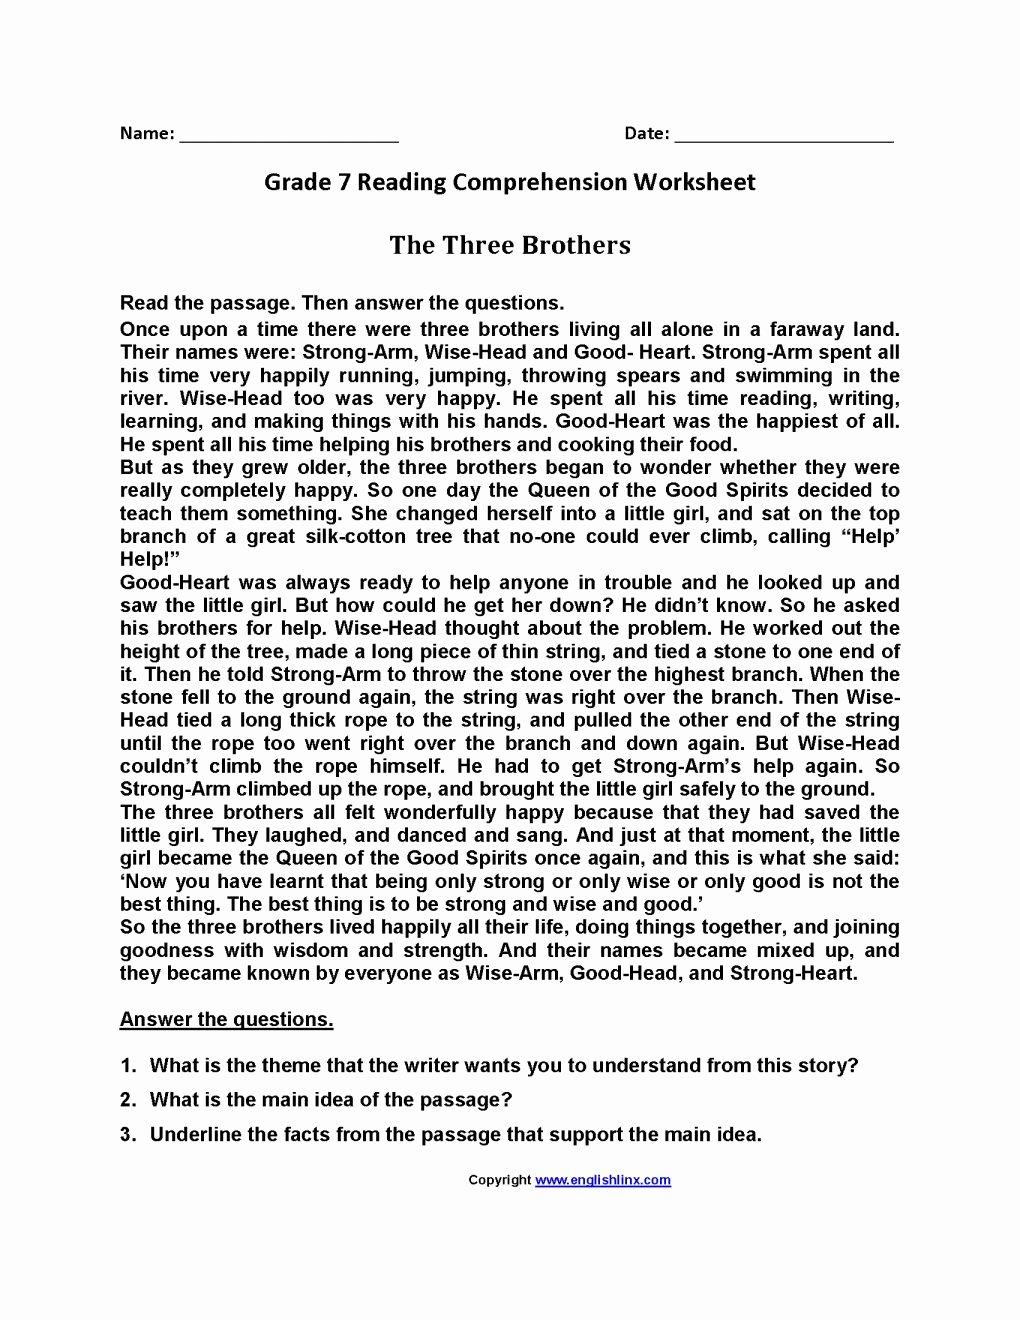 Reading Comprehension Worksheets 7th Grade Lovely 12 7th Grade Summarizing Worksheet